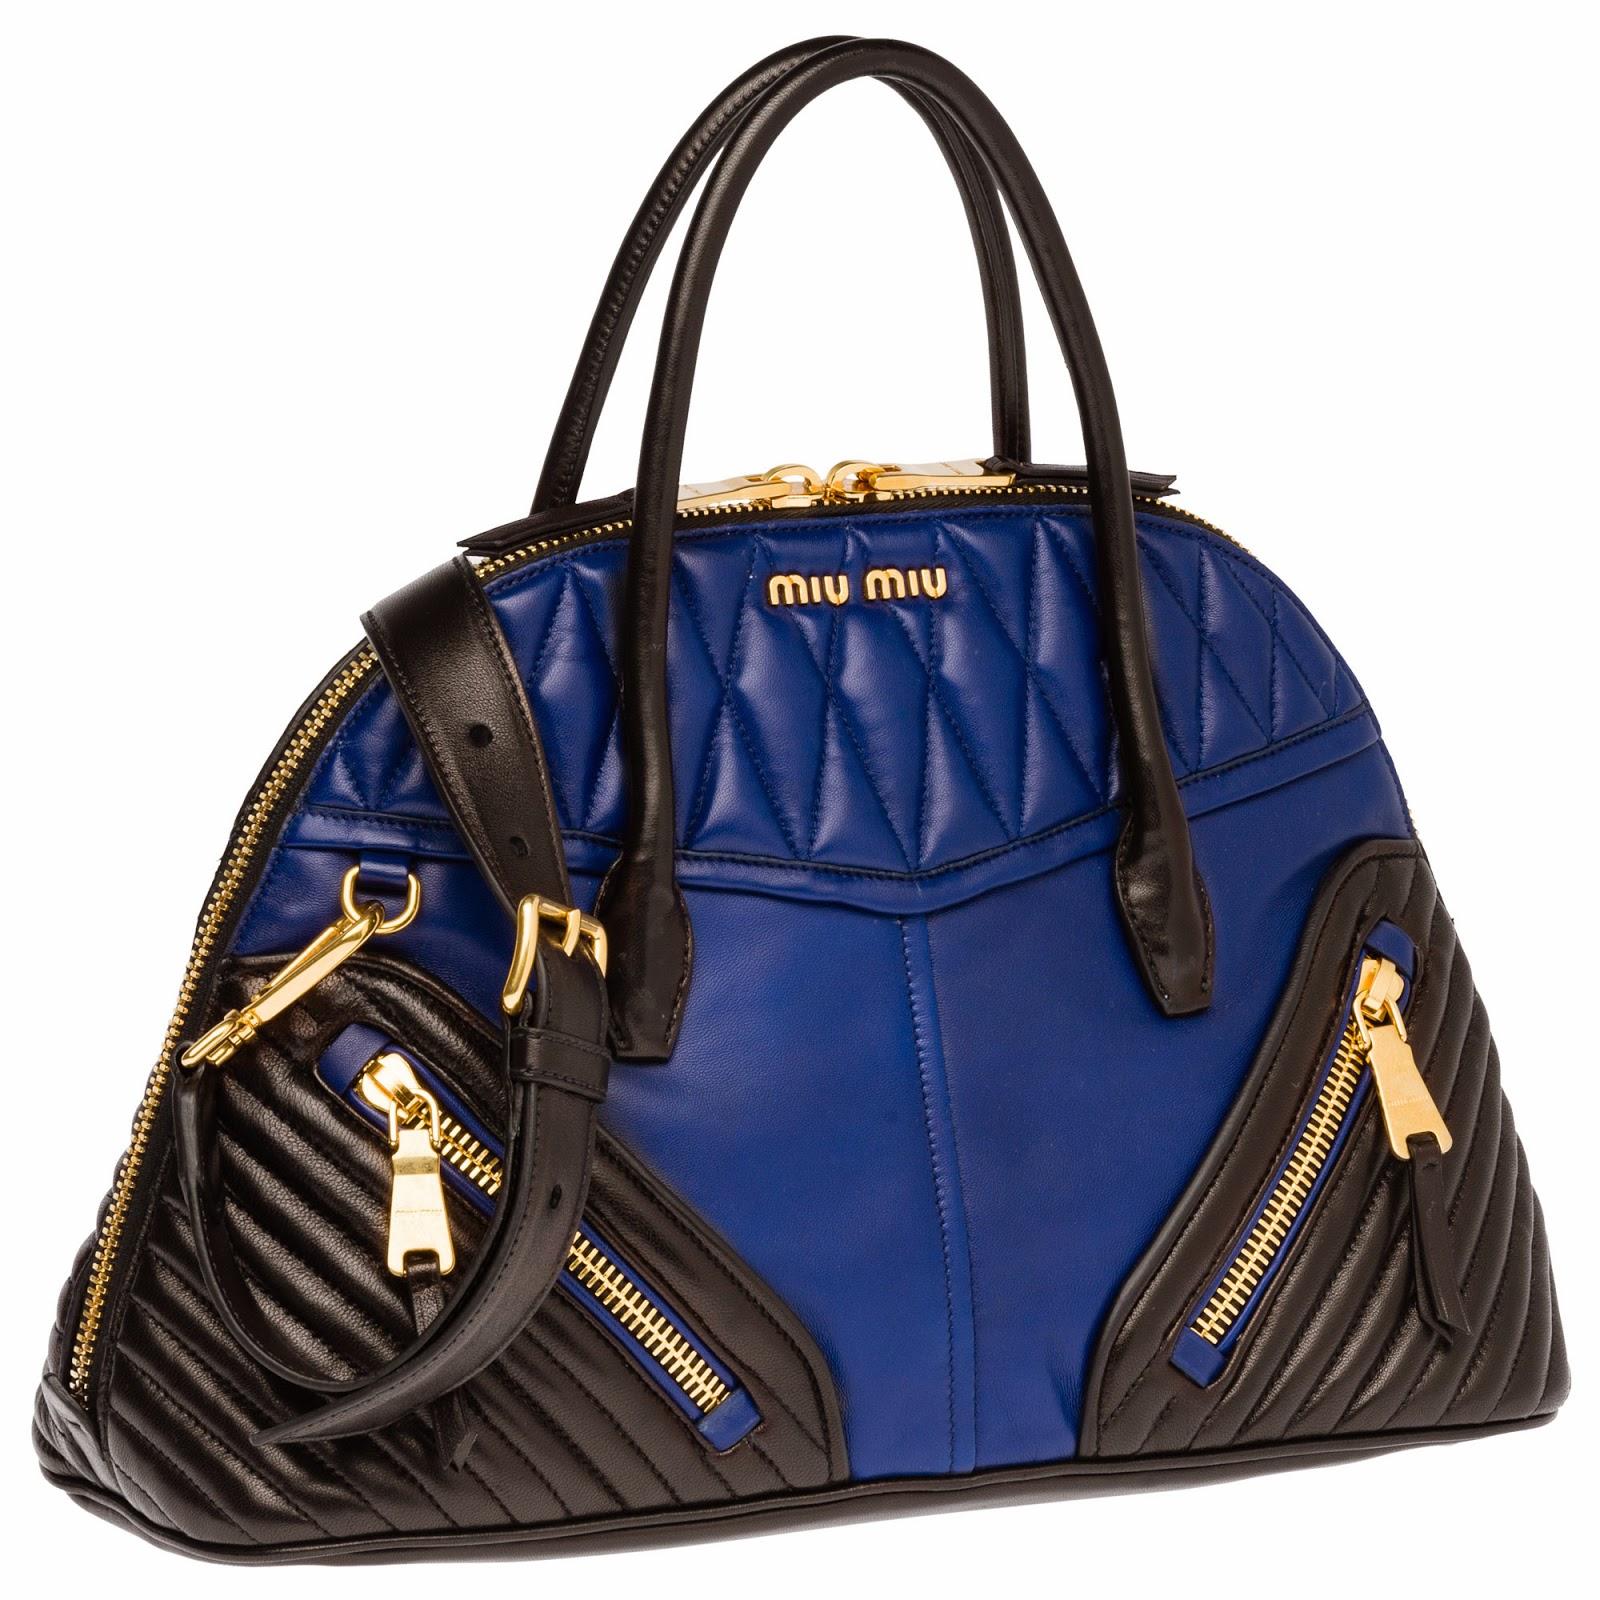 miu+miu+%25C3%25A7anta+modelleri Miu Miu Herbst Winter 2014 Handtaschen Modelle